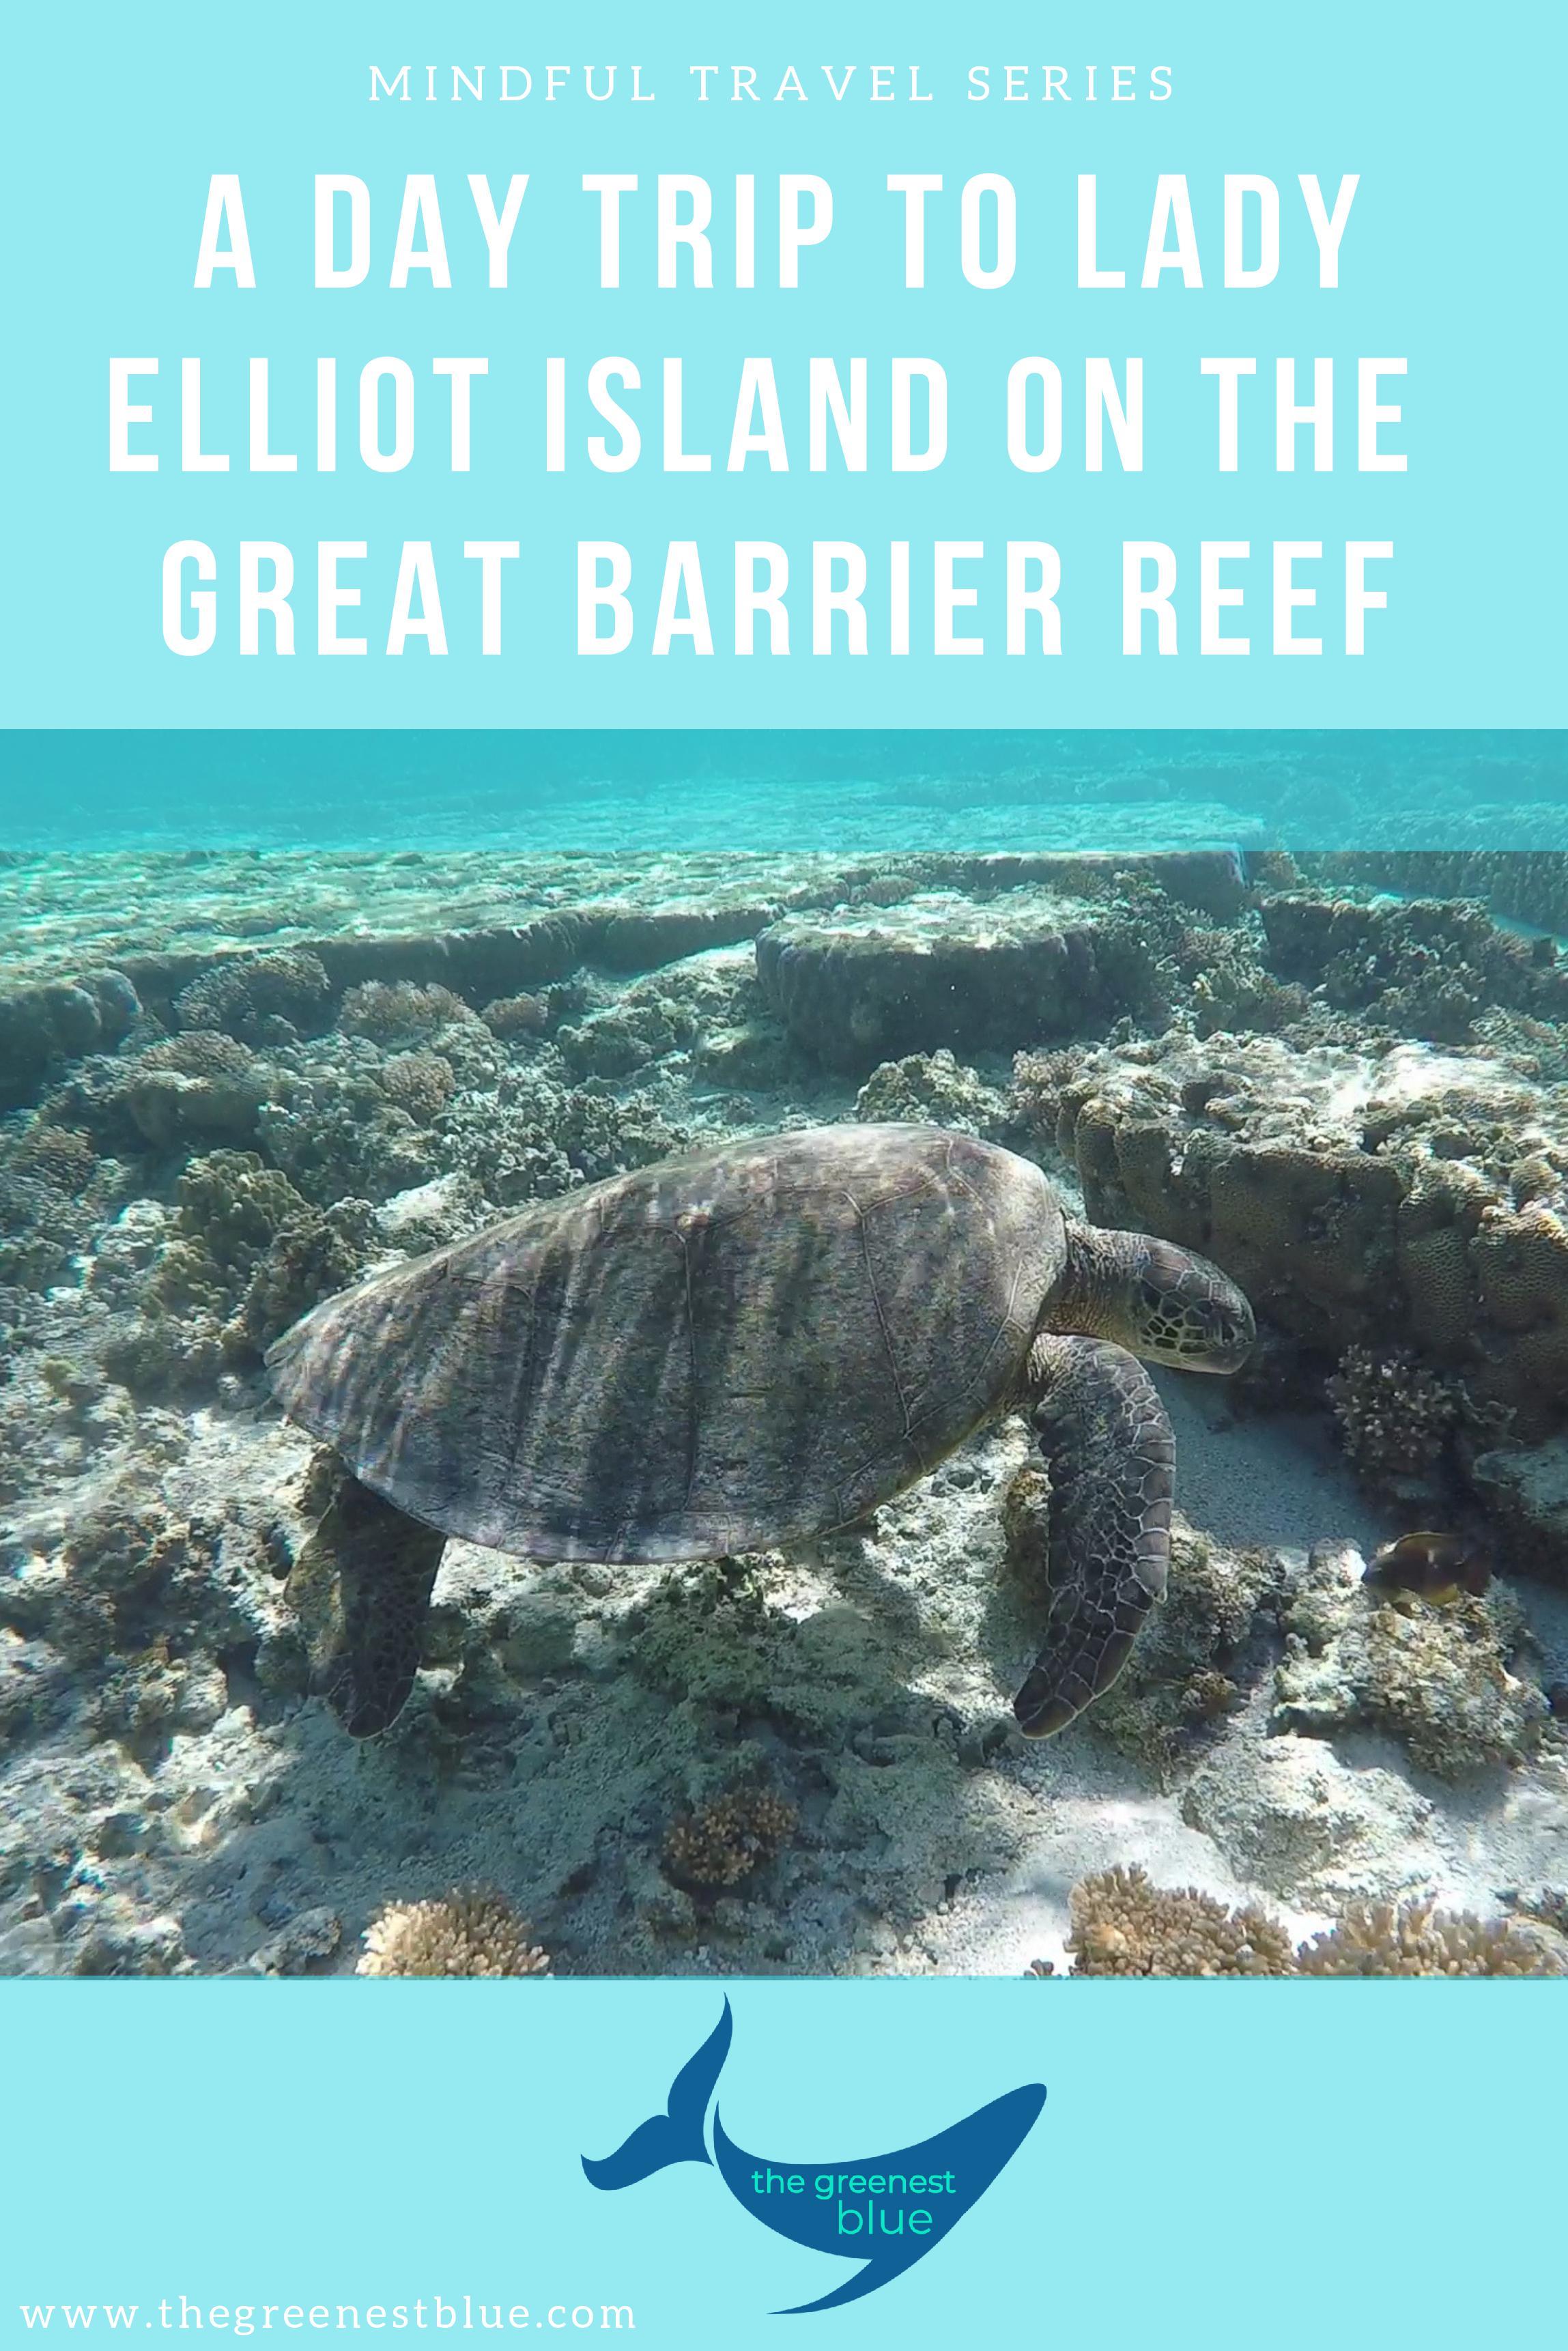 A Day Trip to Lady Elliot Island